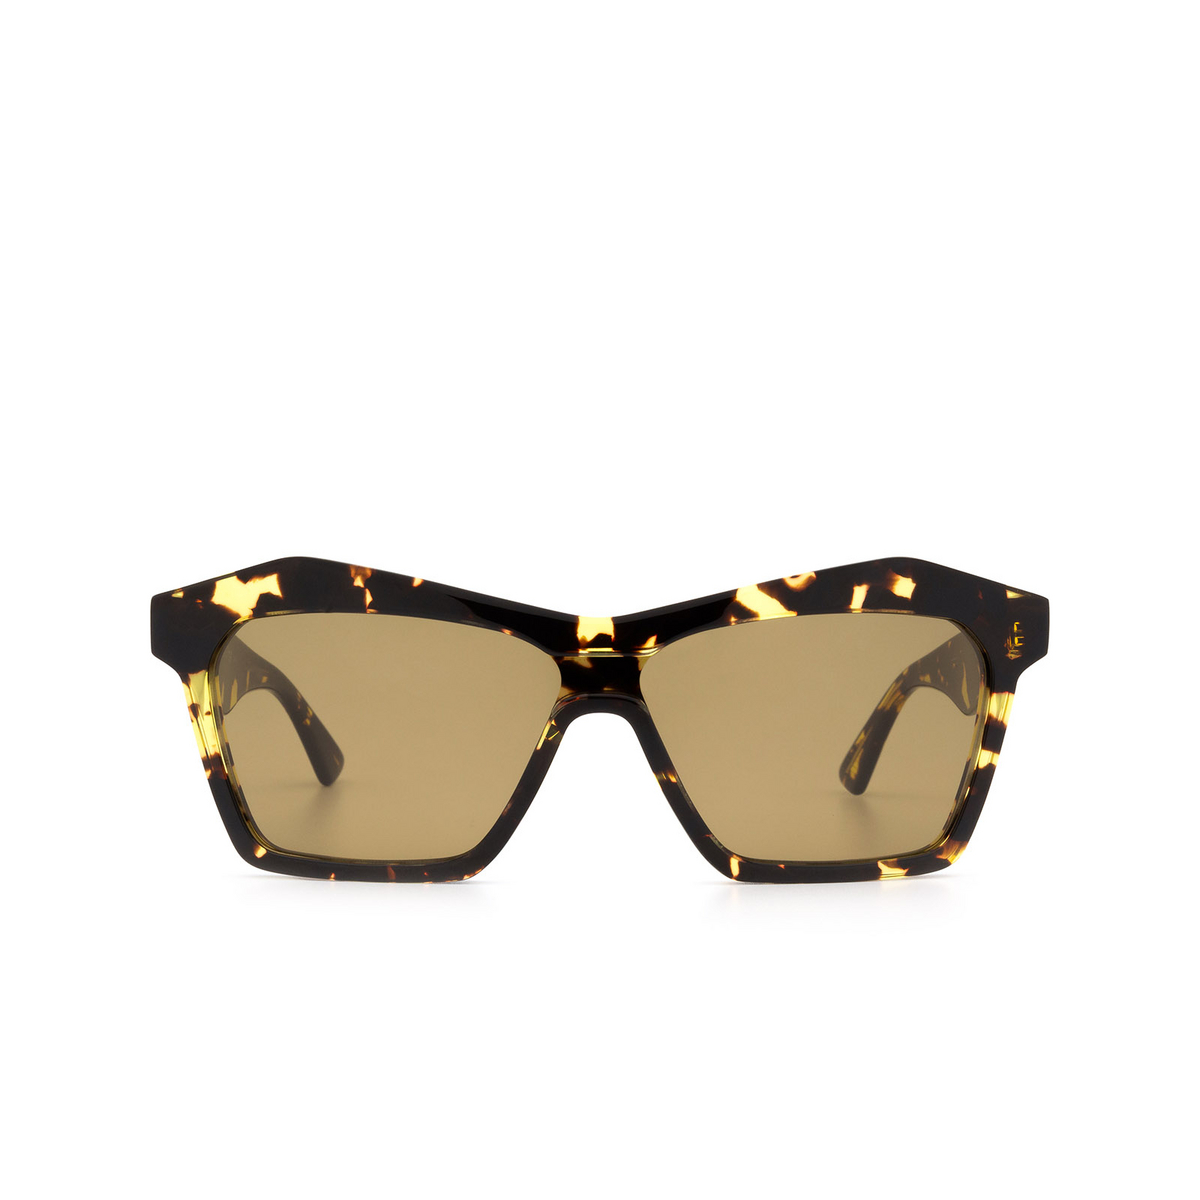 Bottega Veneta® Irregular Sunglasses: BV1093S color Havana 002 - front view.